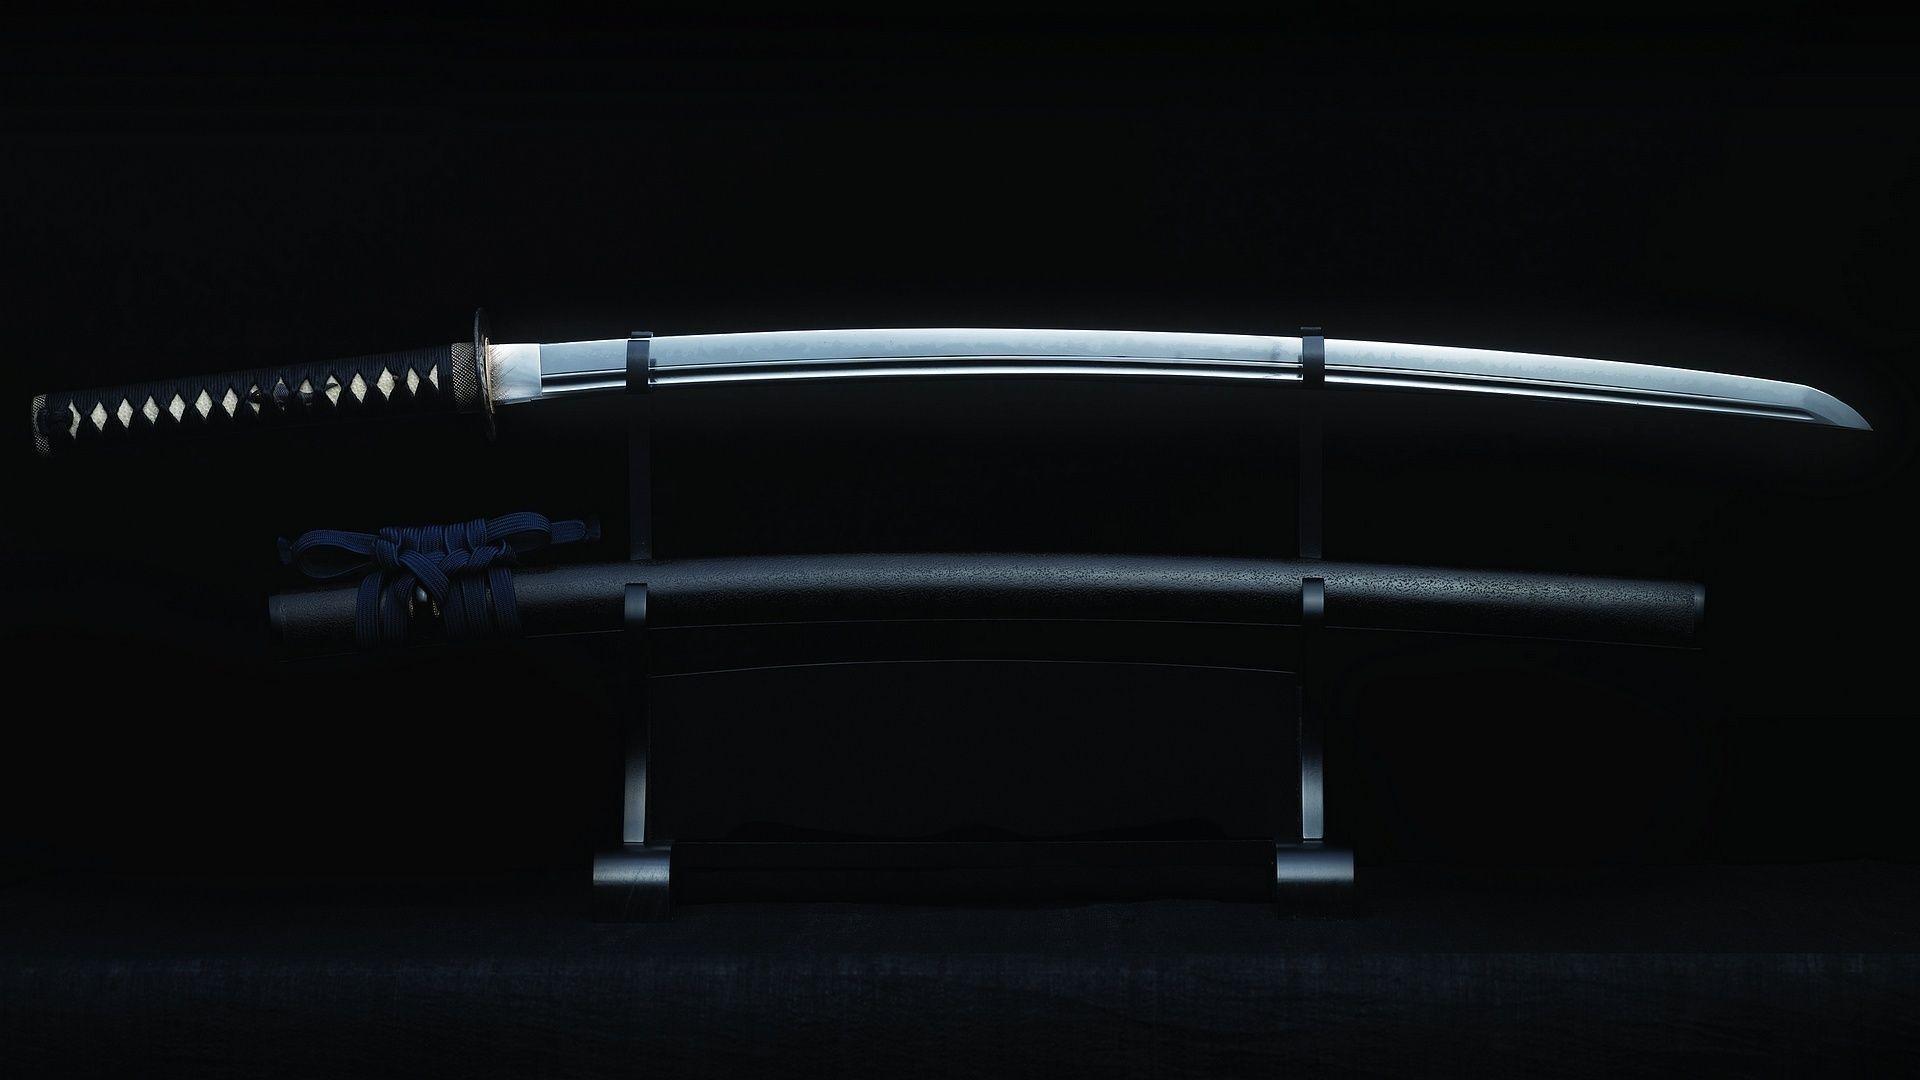 Images For > Samurai Swords Wallpaper 1920x1080